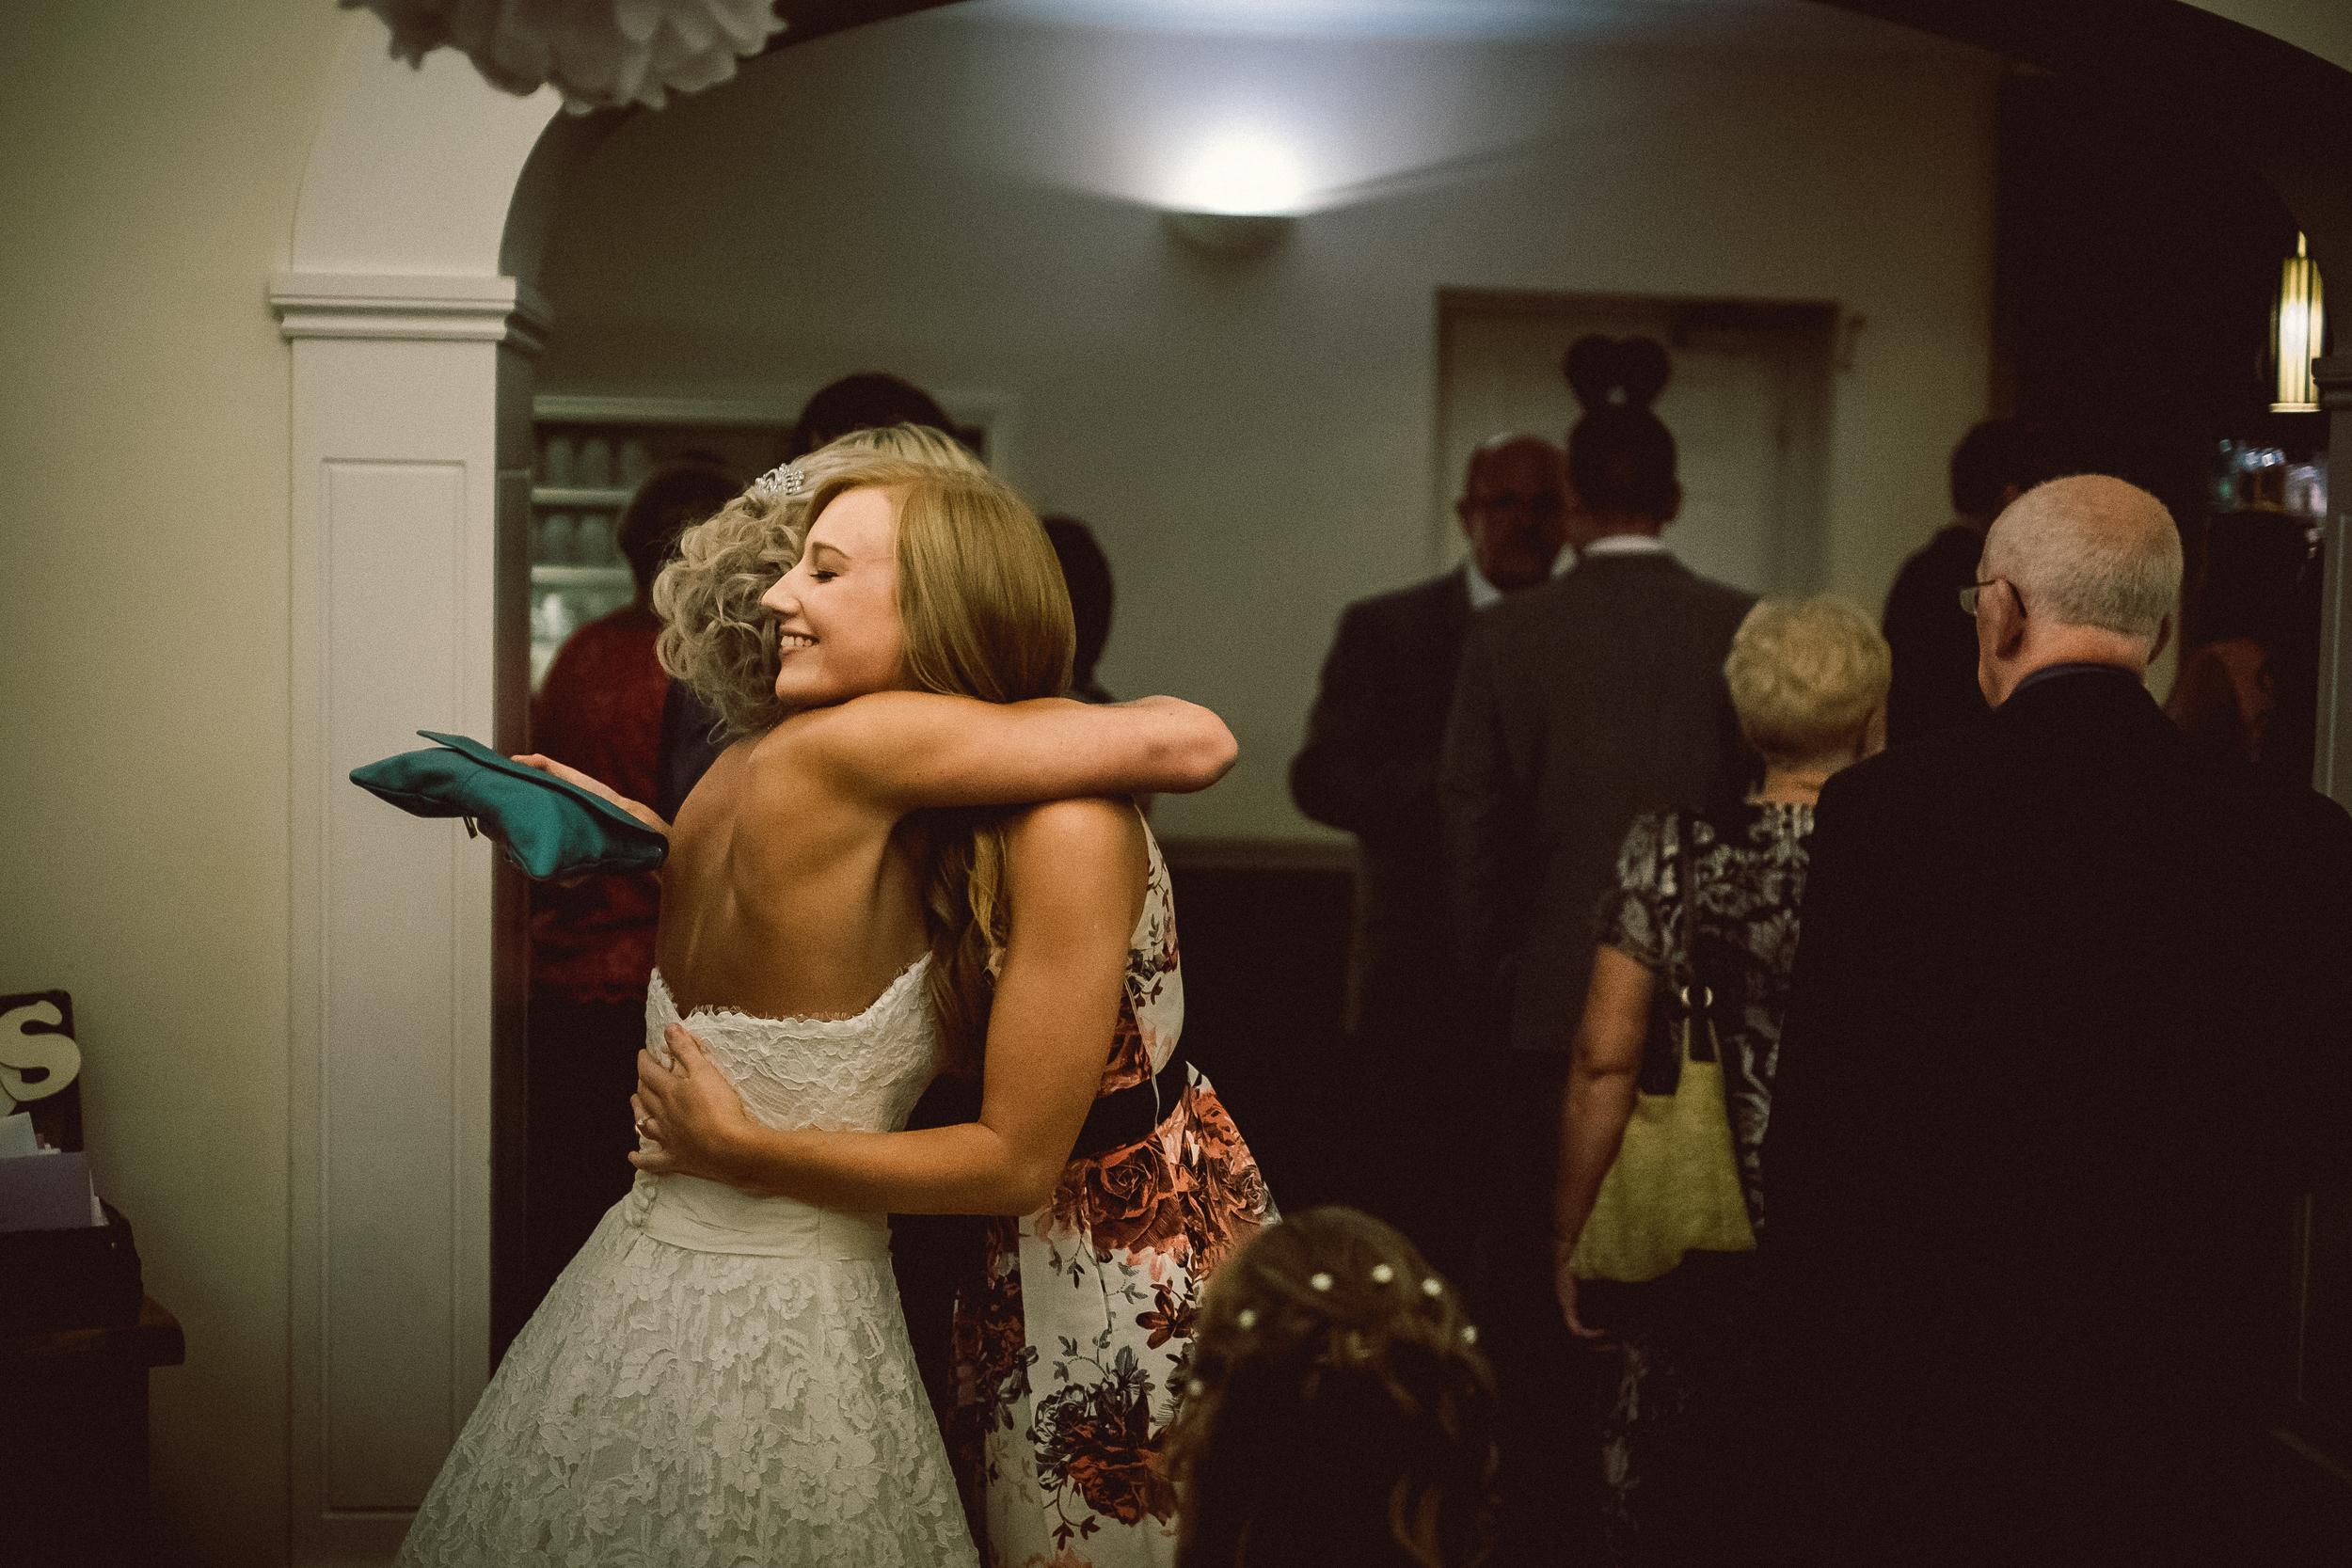 A Monmouth Wedding. | Fuji XE1 | 35mm | F1.4 - 1/400th - iso3200